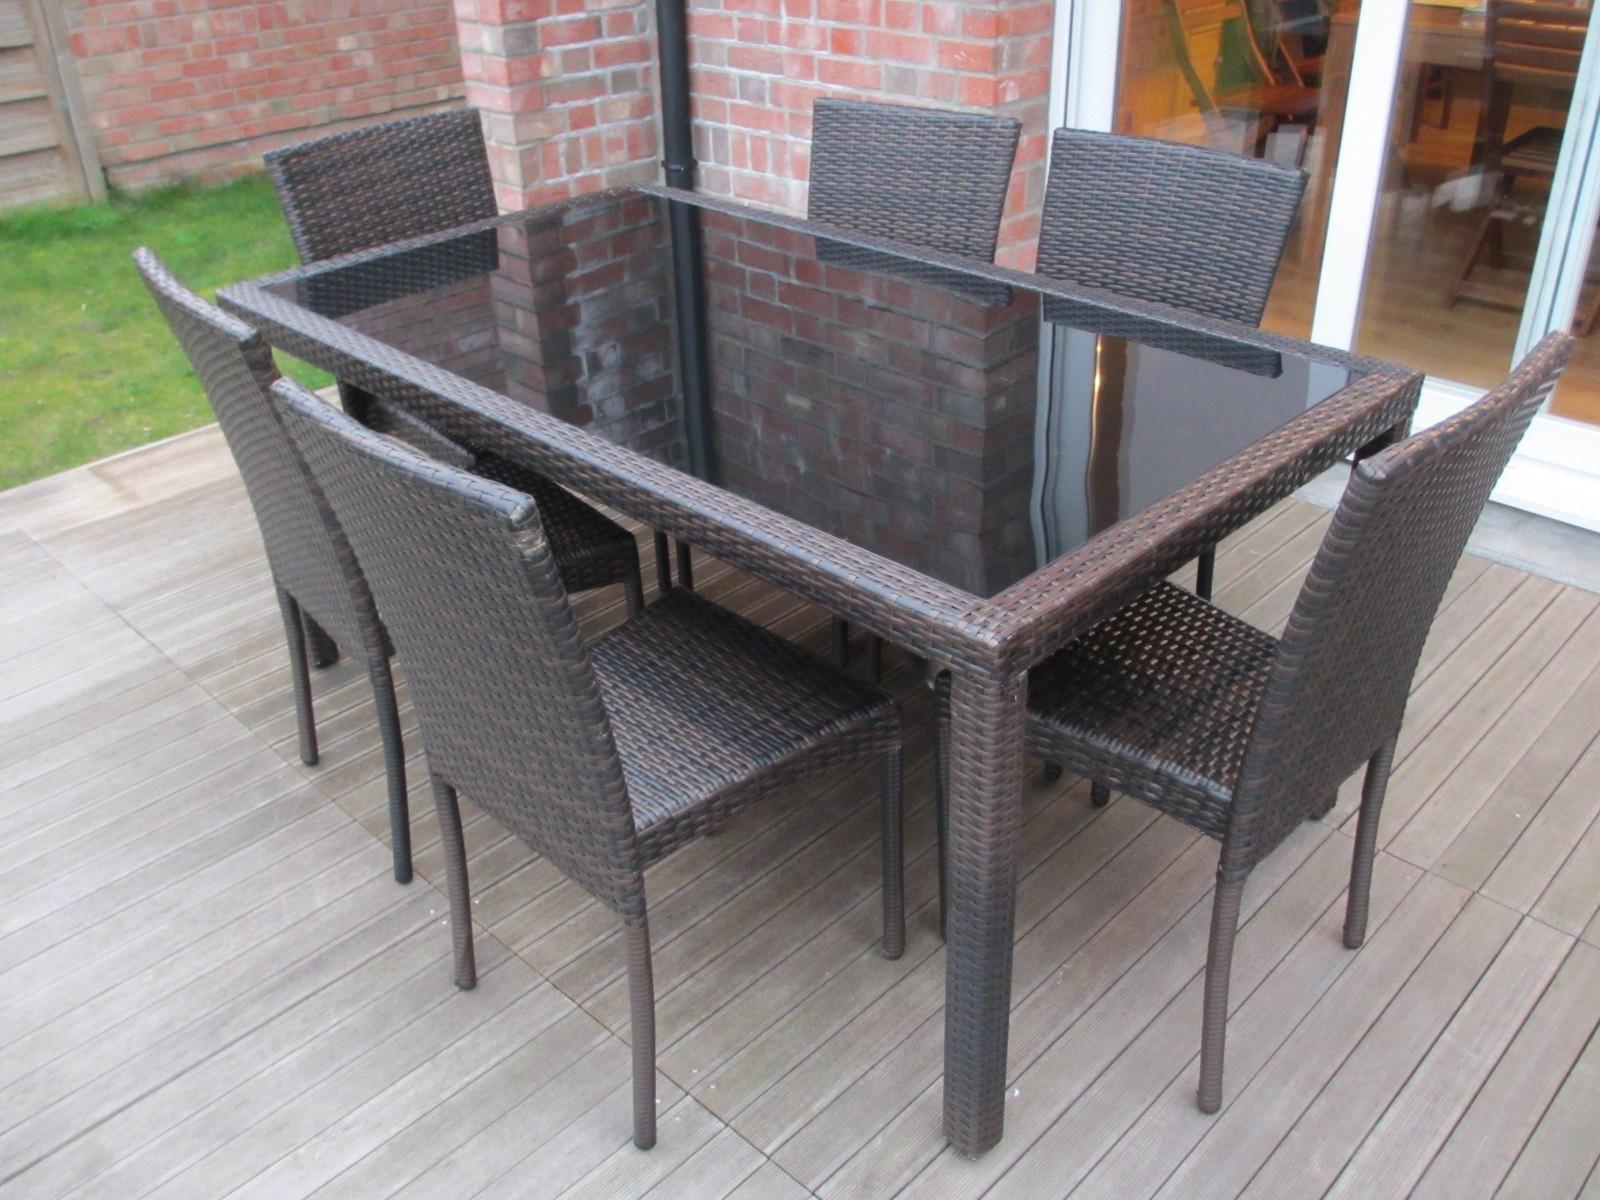 Table et chaise de jardin Mailleraye jardin